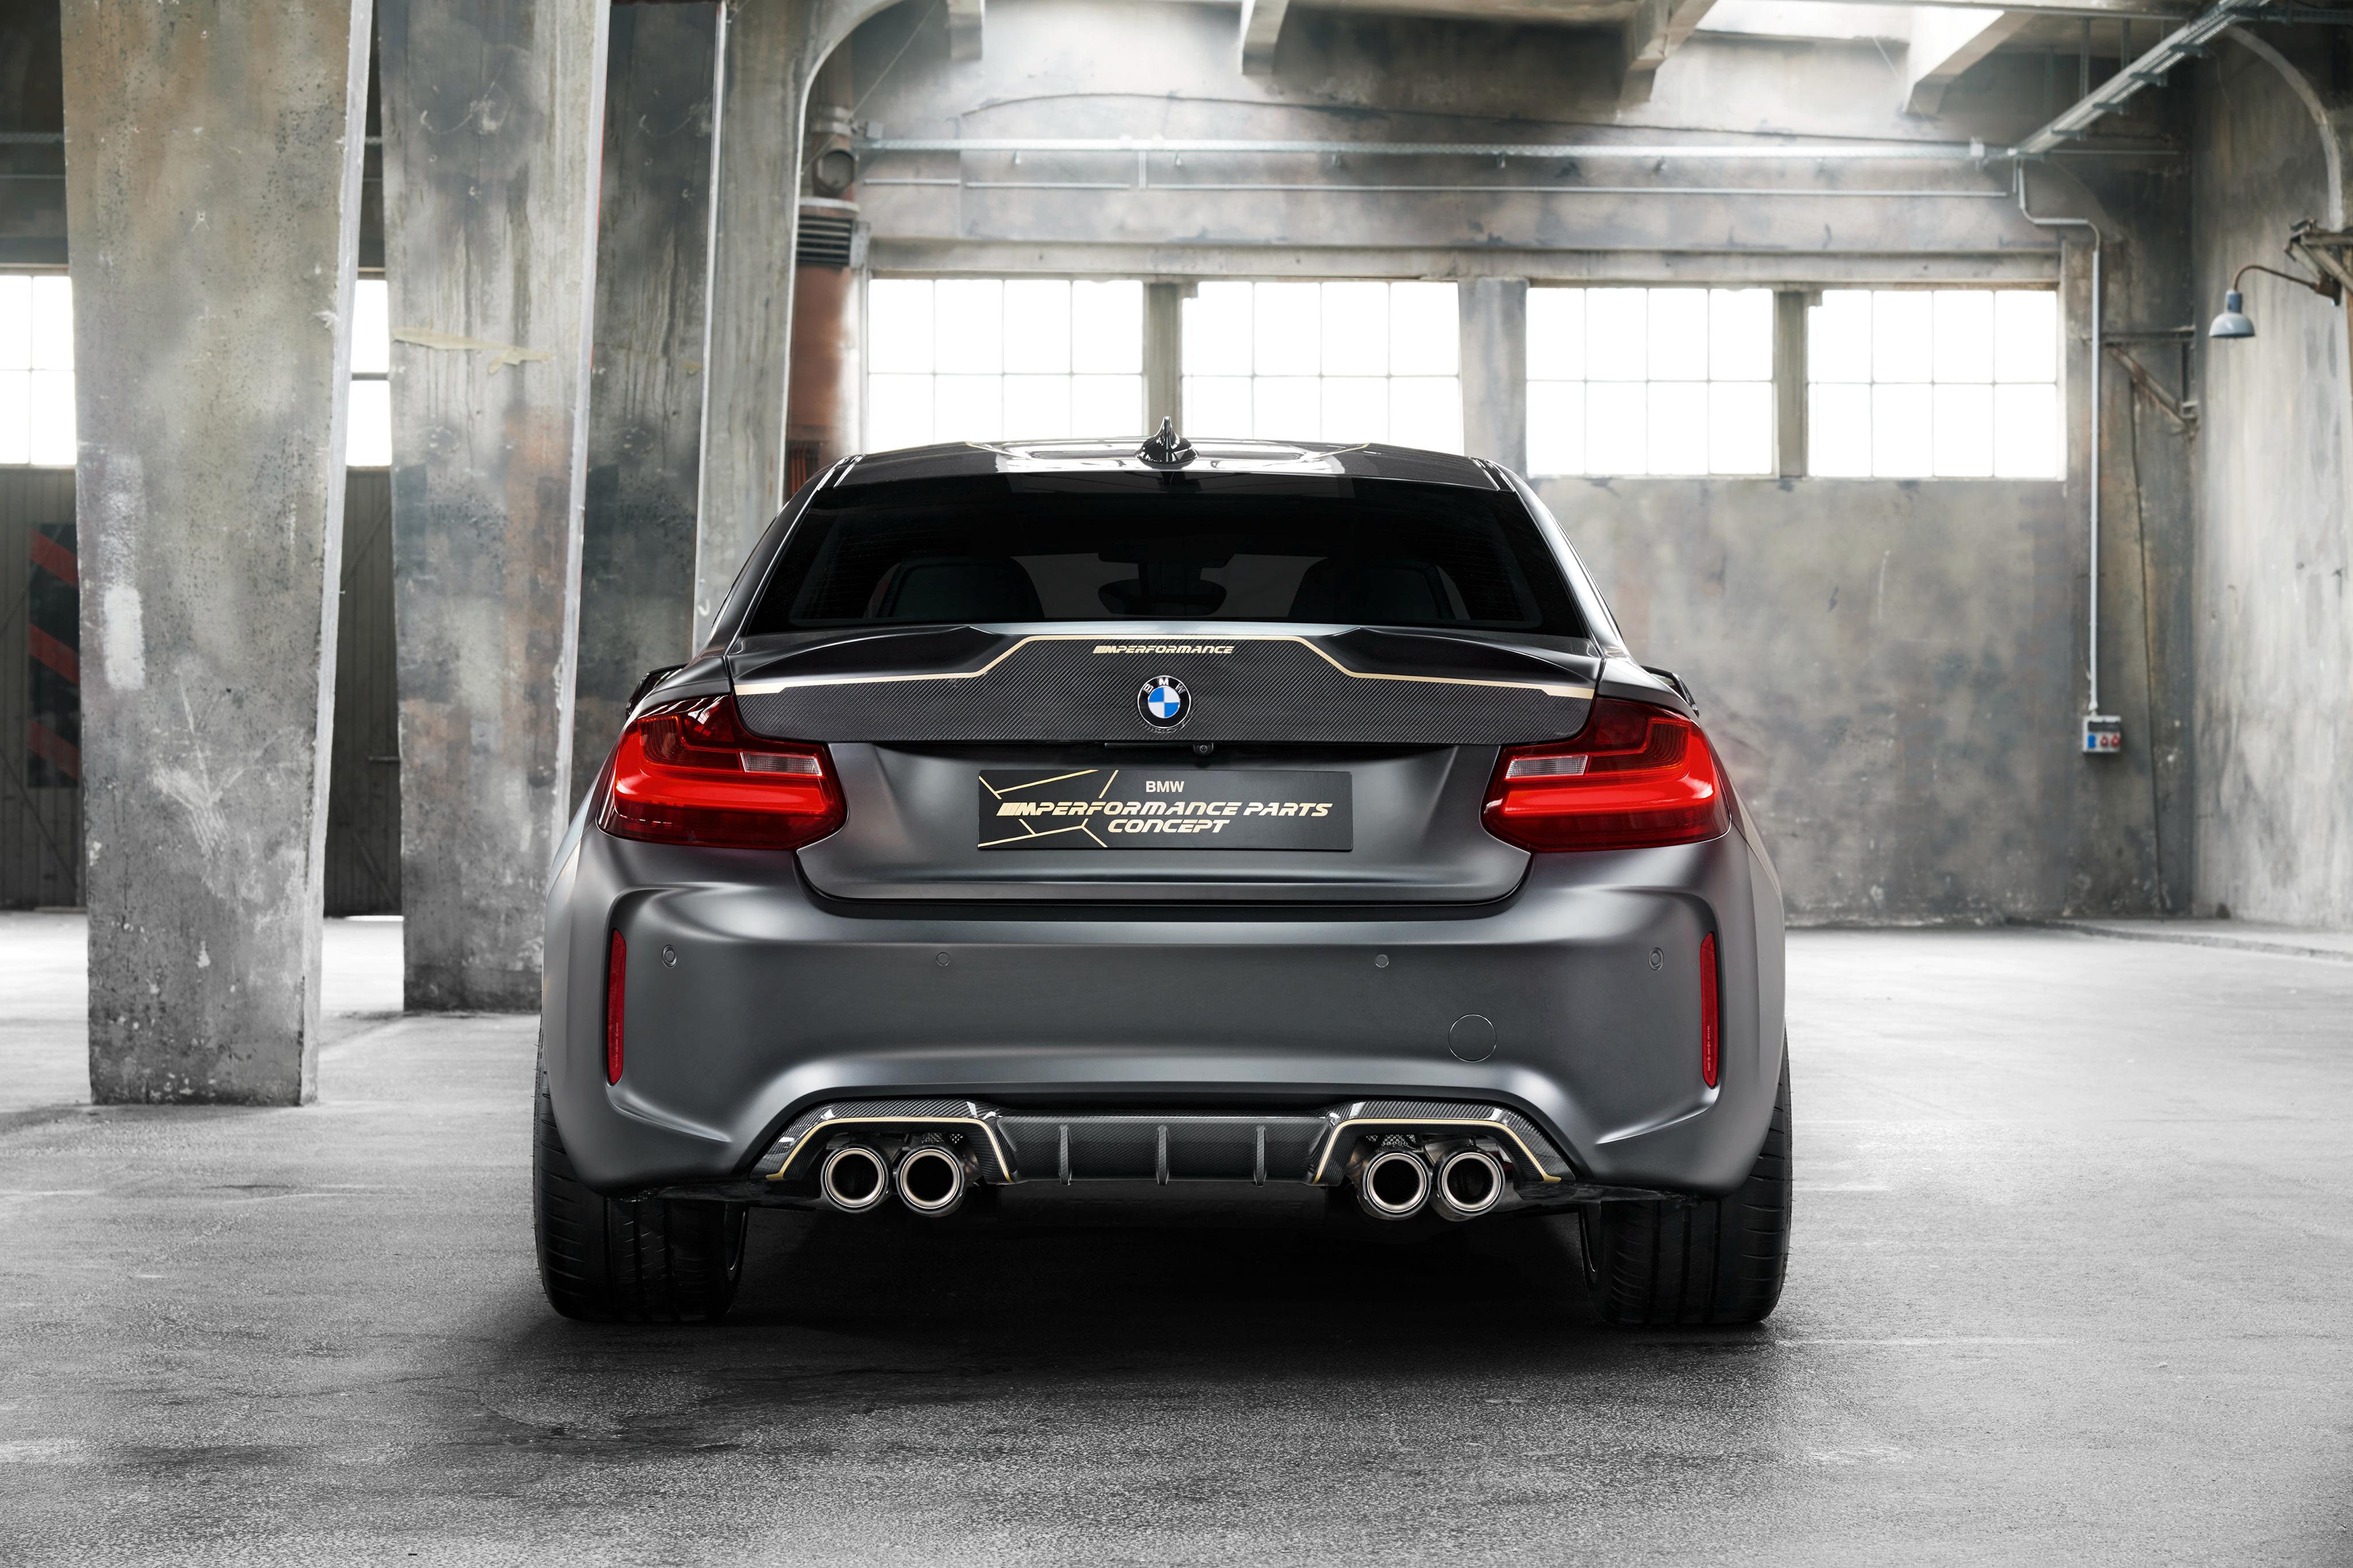 BMW M2 M Performance Parts Concept 2018 Rear, HD Cars, 4k ...